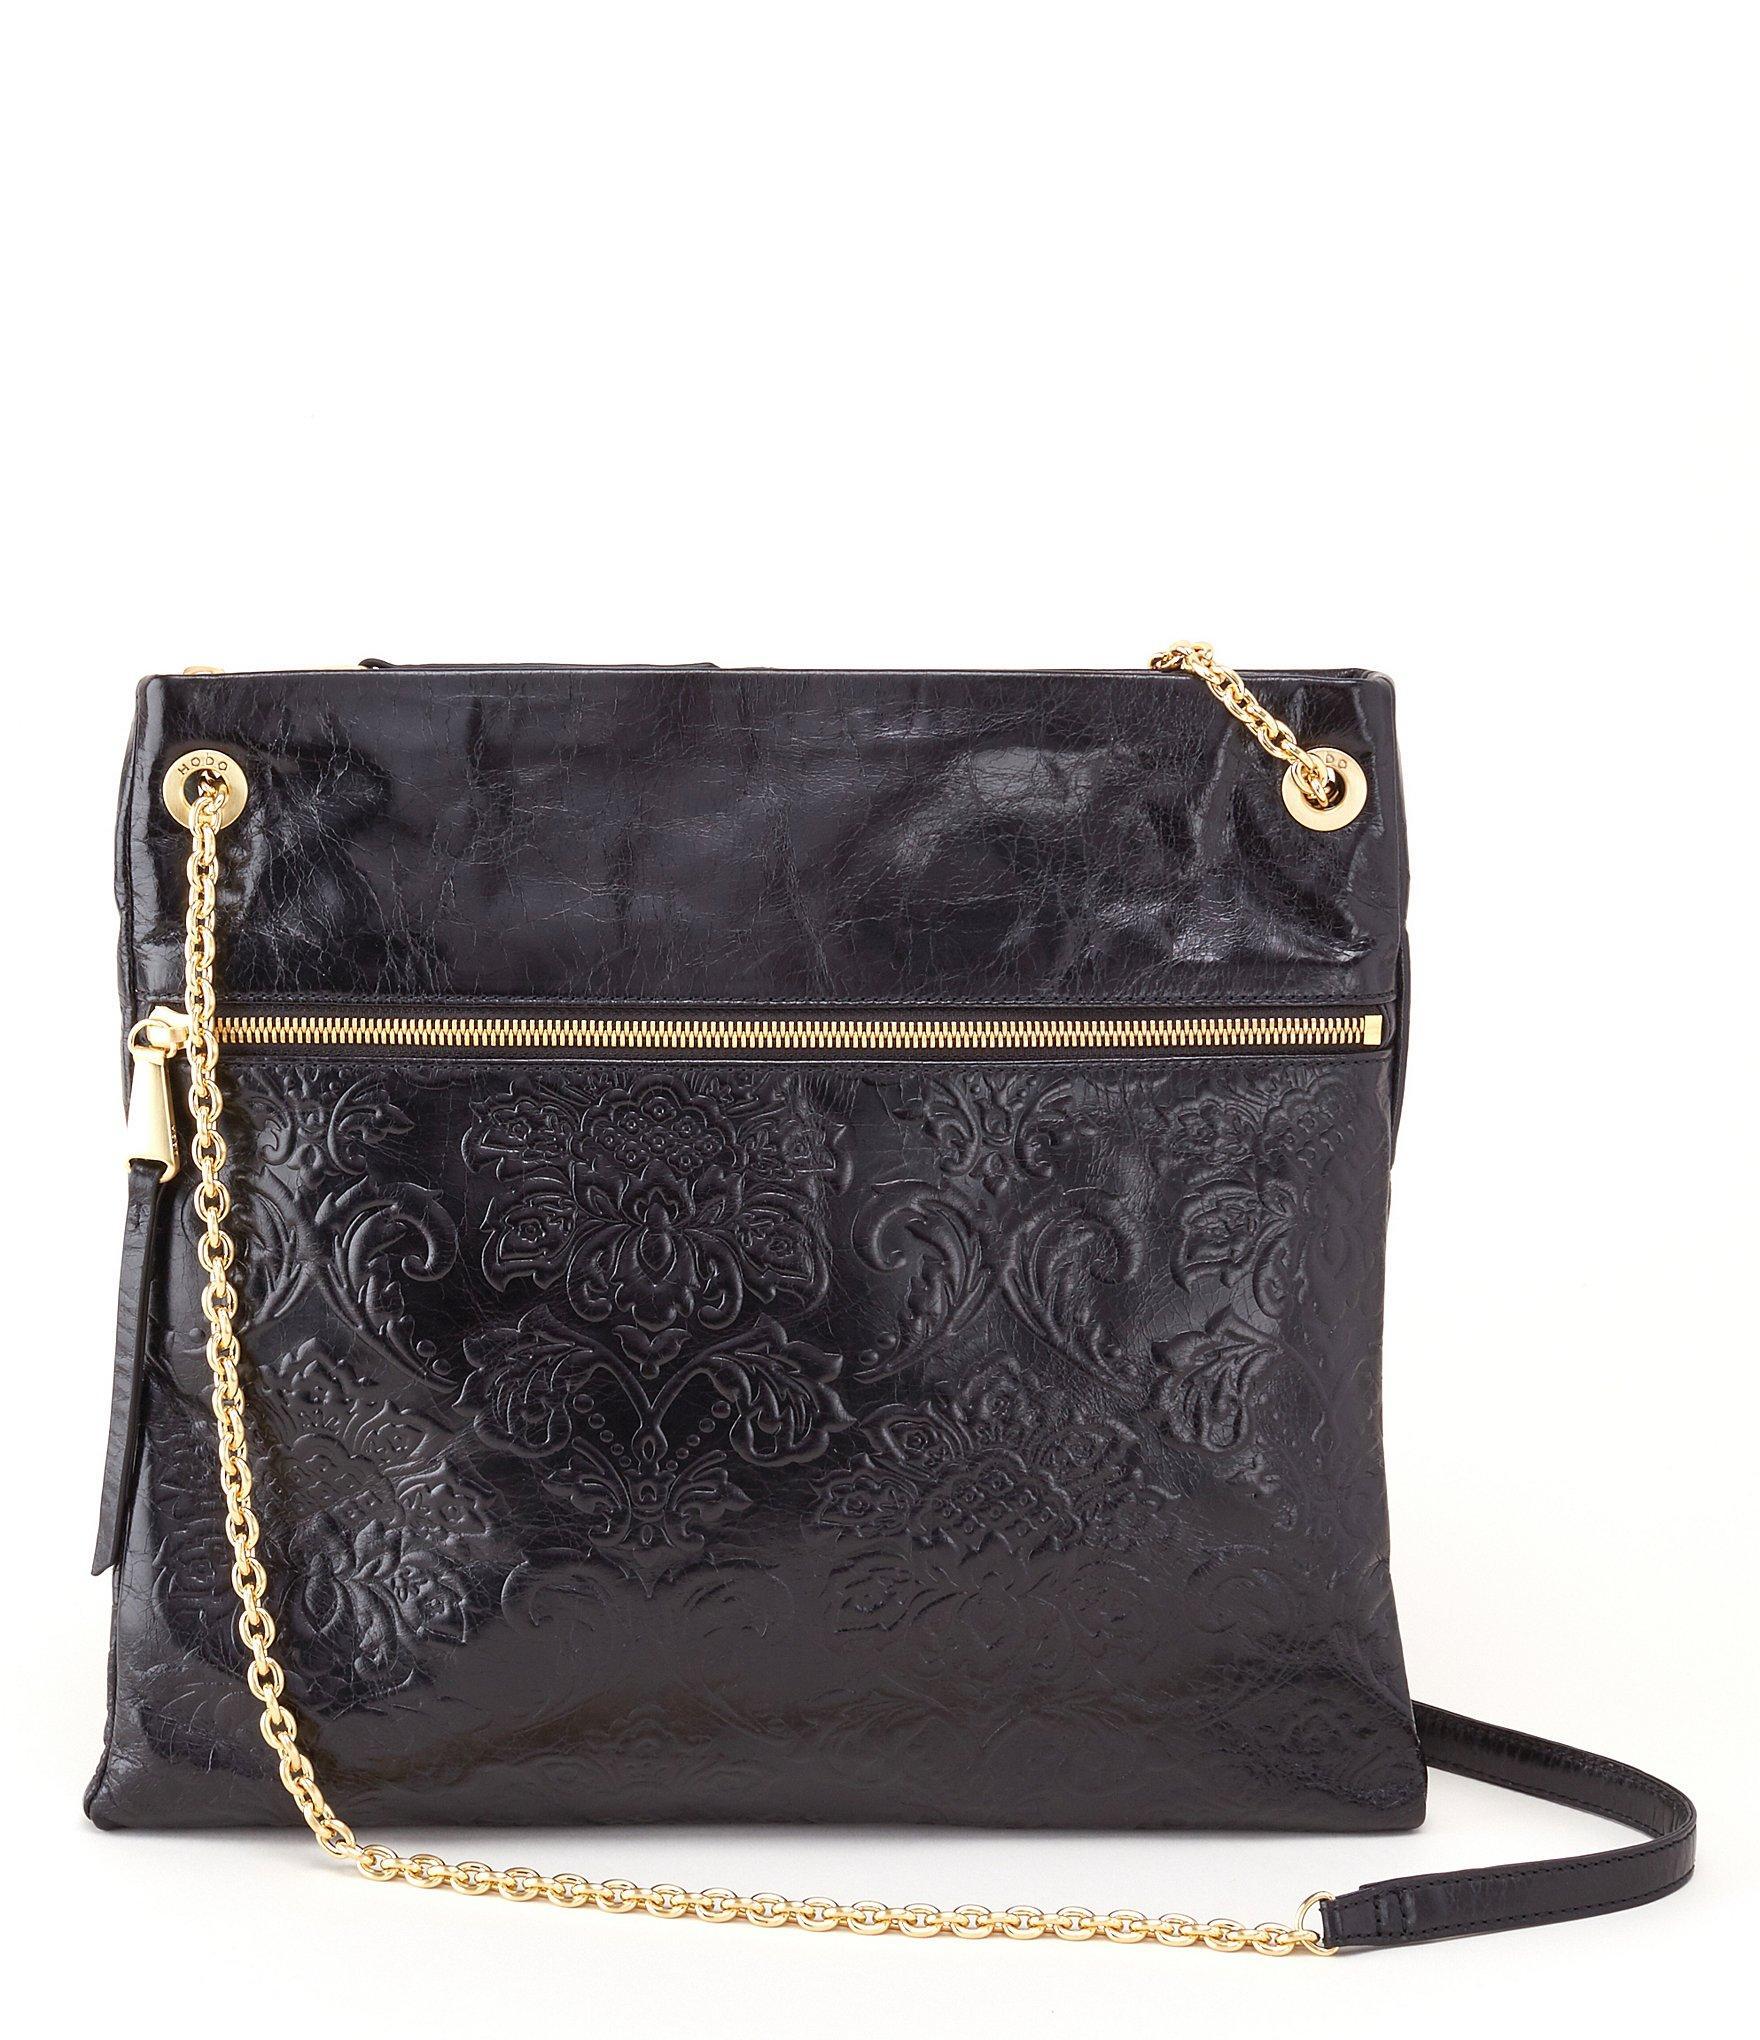 03481b3904ae Lyst - Hobo Dayna Convertible Cross-body Bag in Black